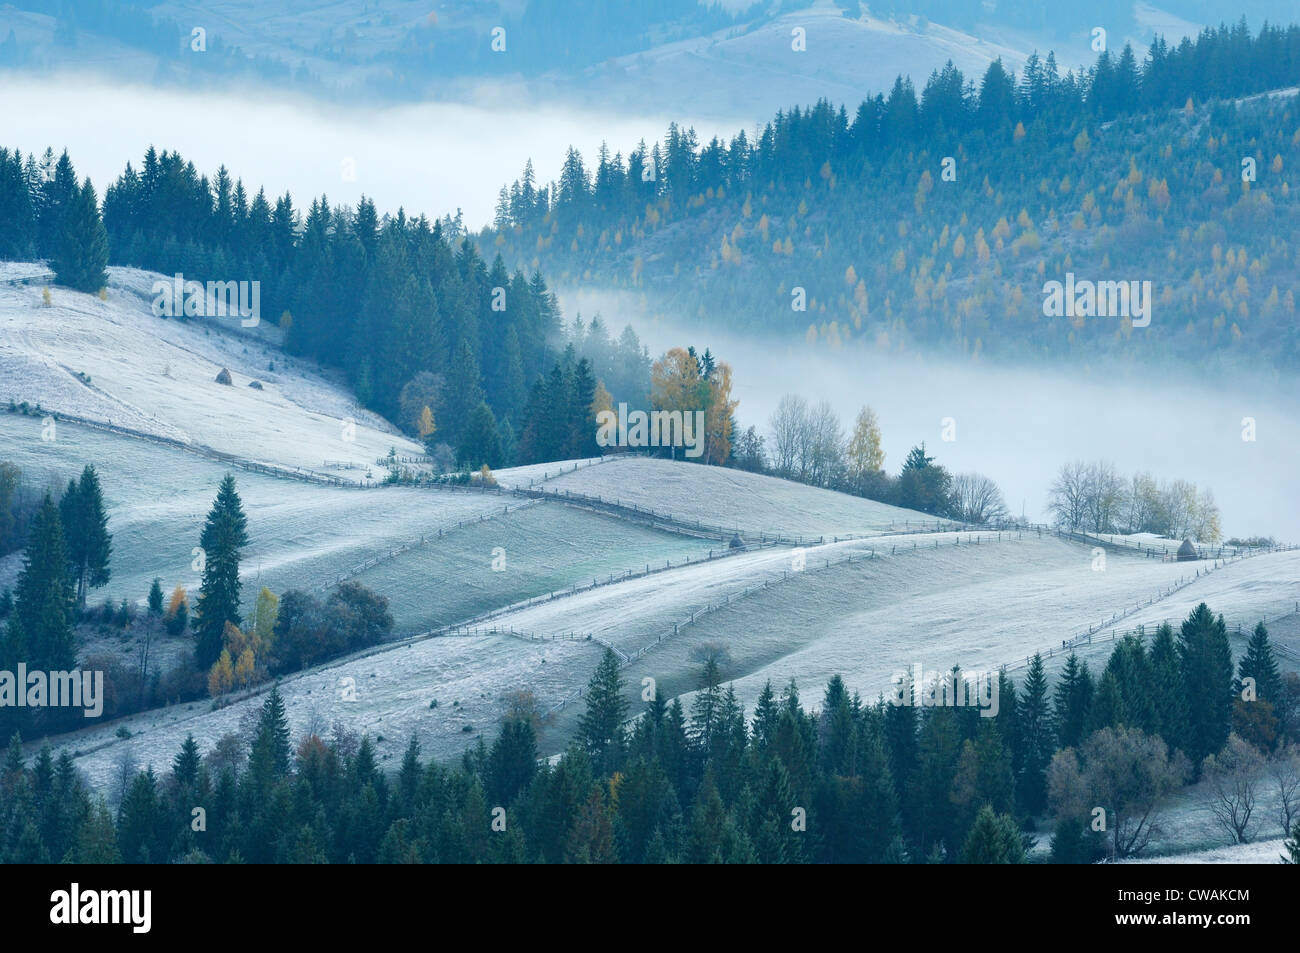 Misty morning, Krasnik village area, Carpathian Mountains, Ivano-Frankivsk region, Ukraine Stock Photo